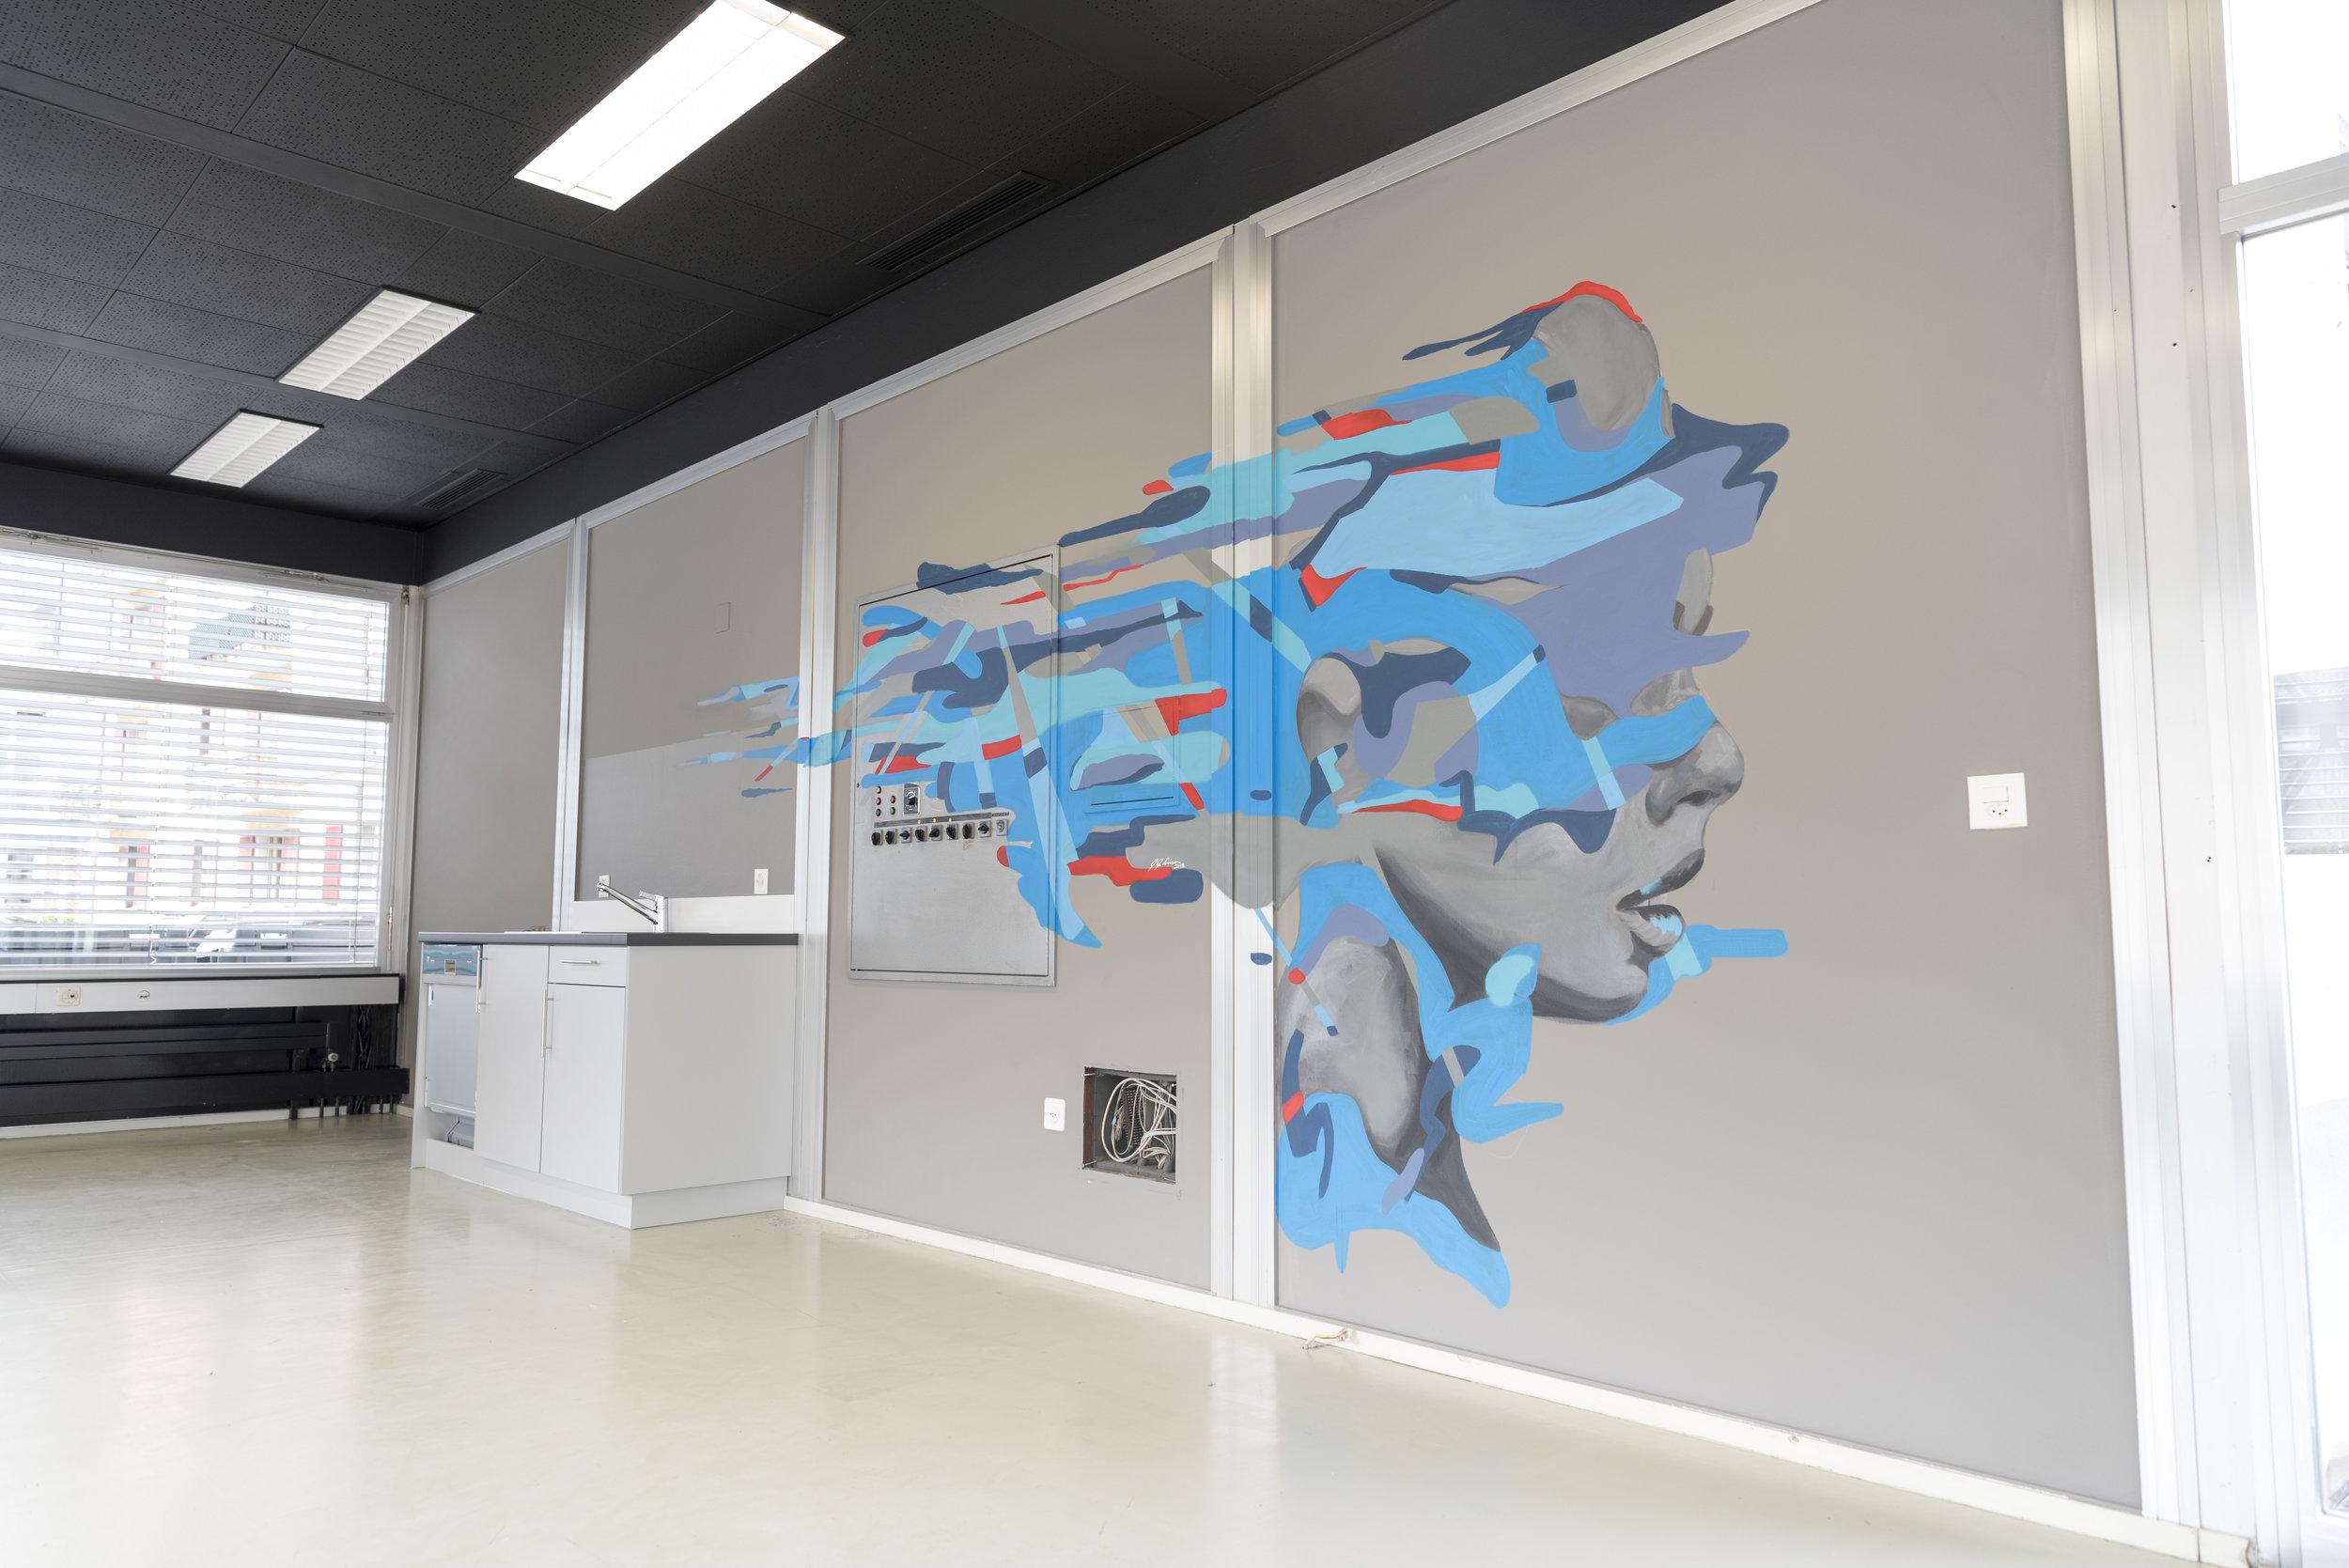 Wall Painting OOH Media